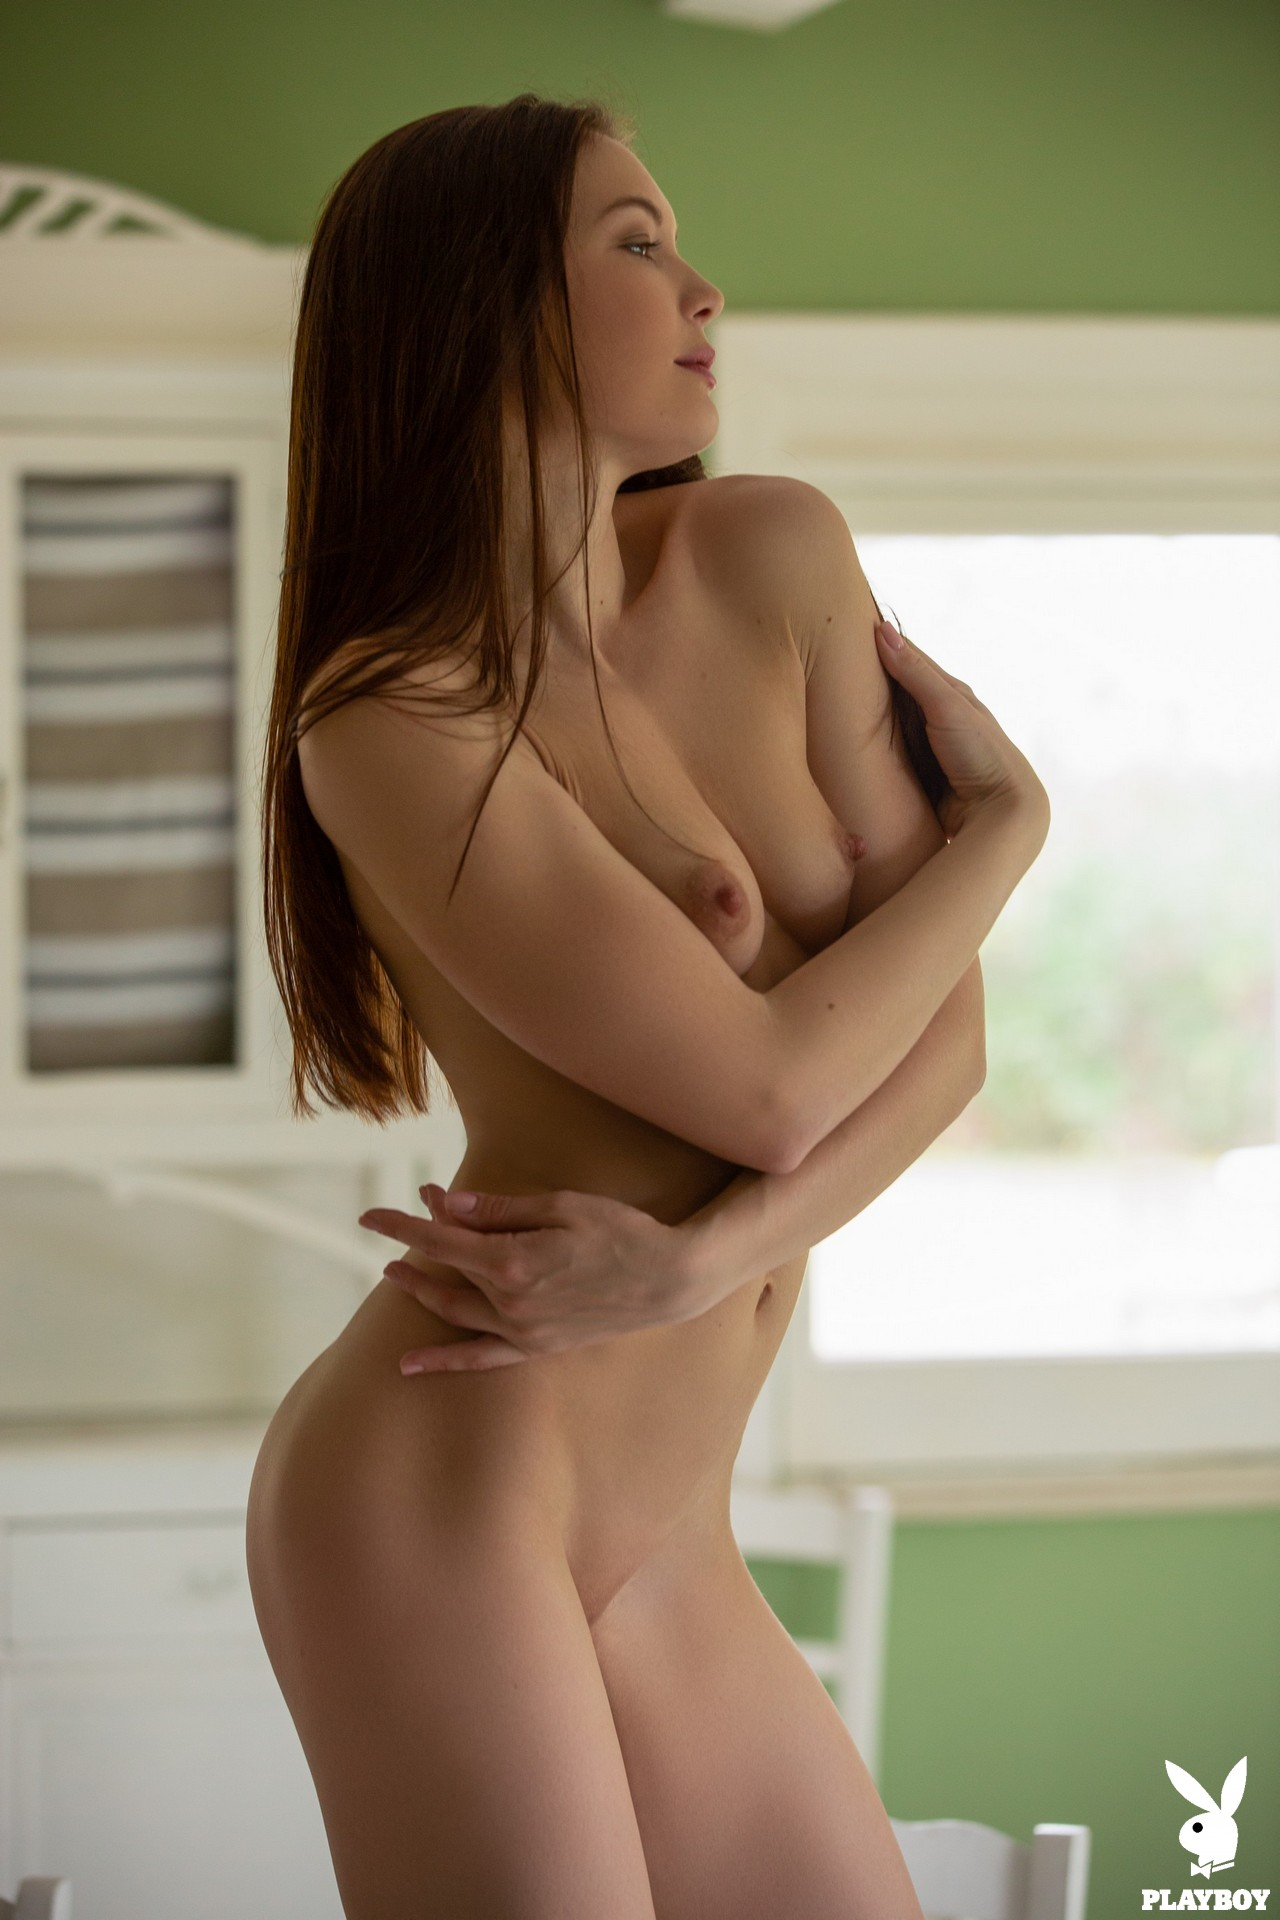 Janeth Tense in Delightful Daybreak - Playboy Plus 6